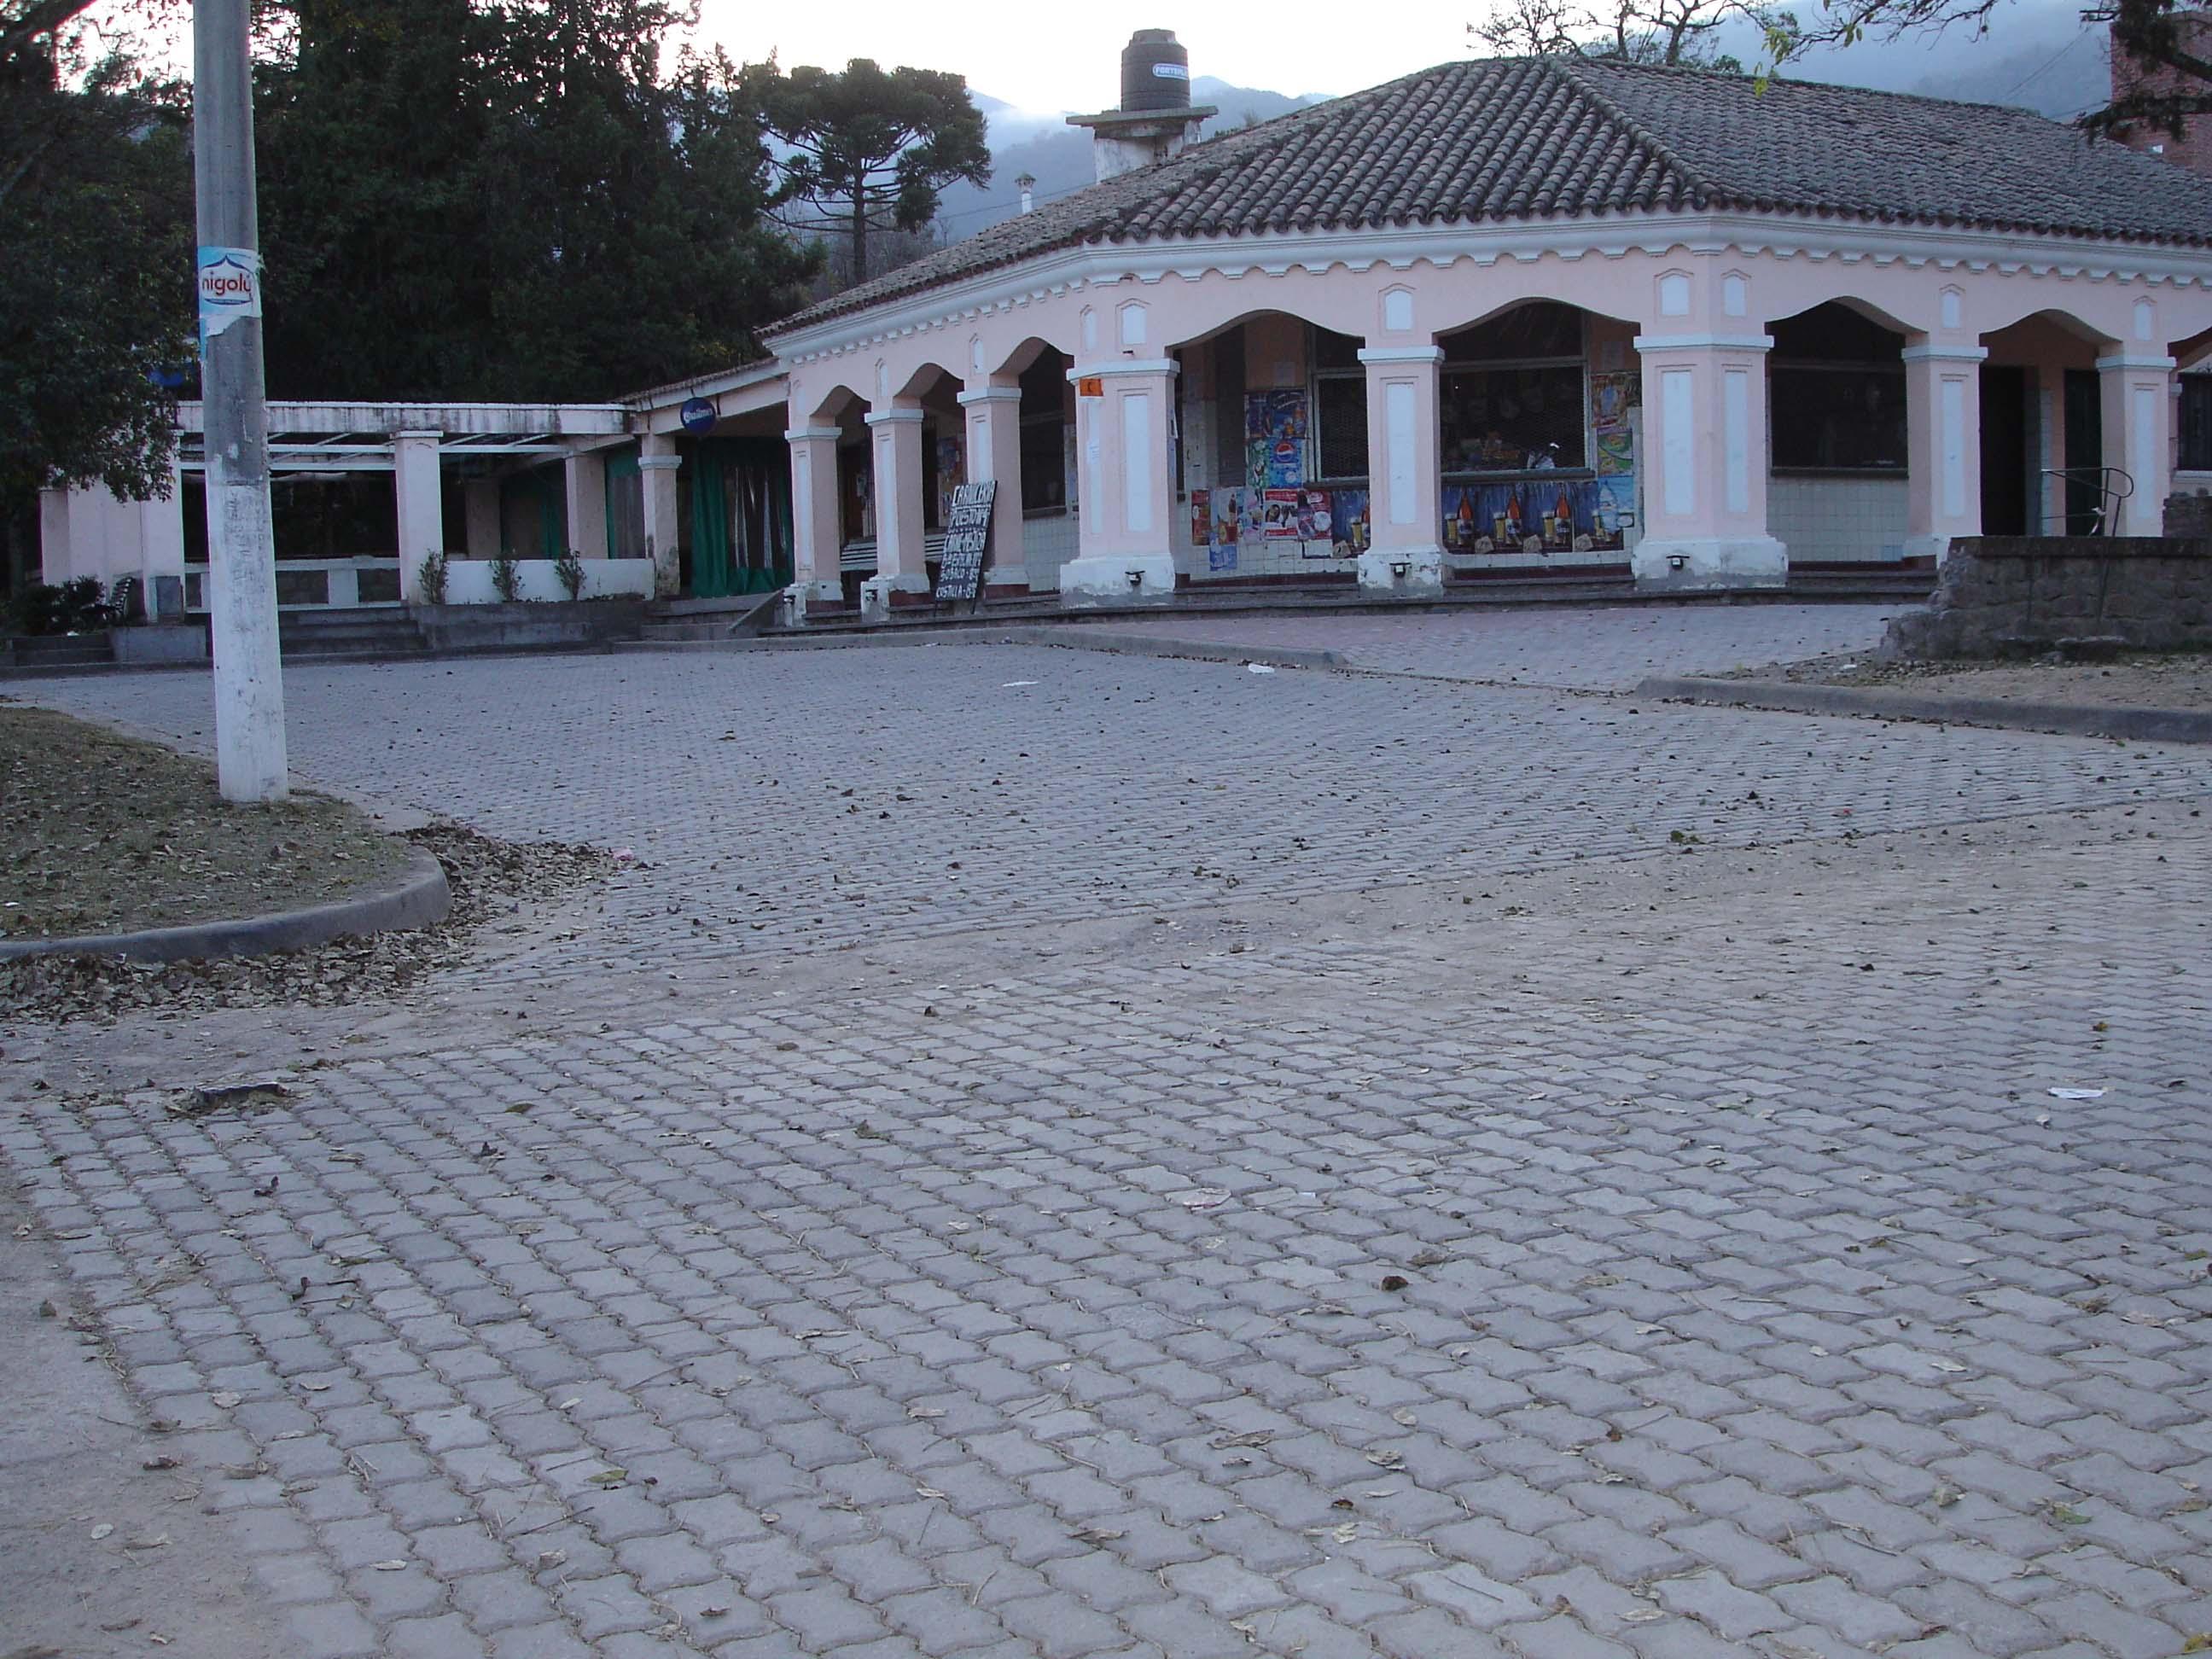 SanLorenzo01